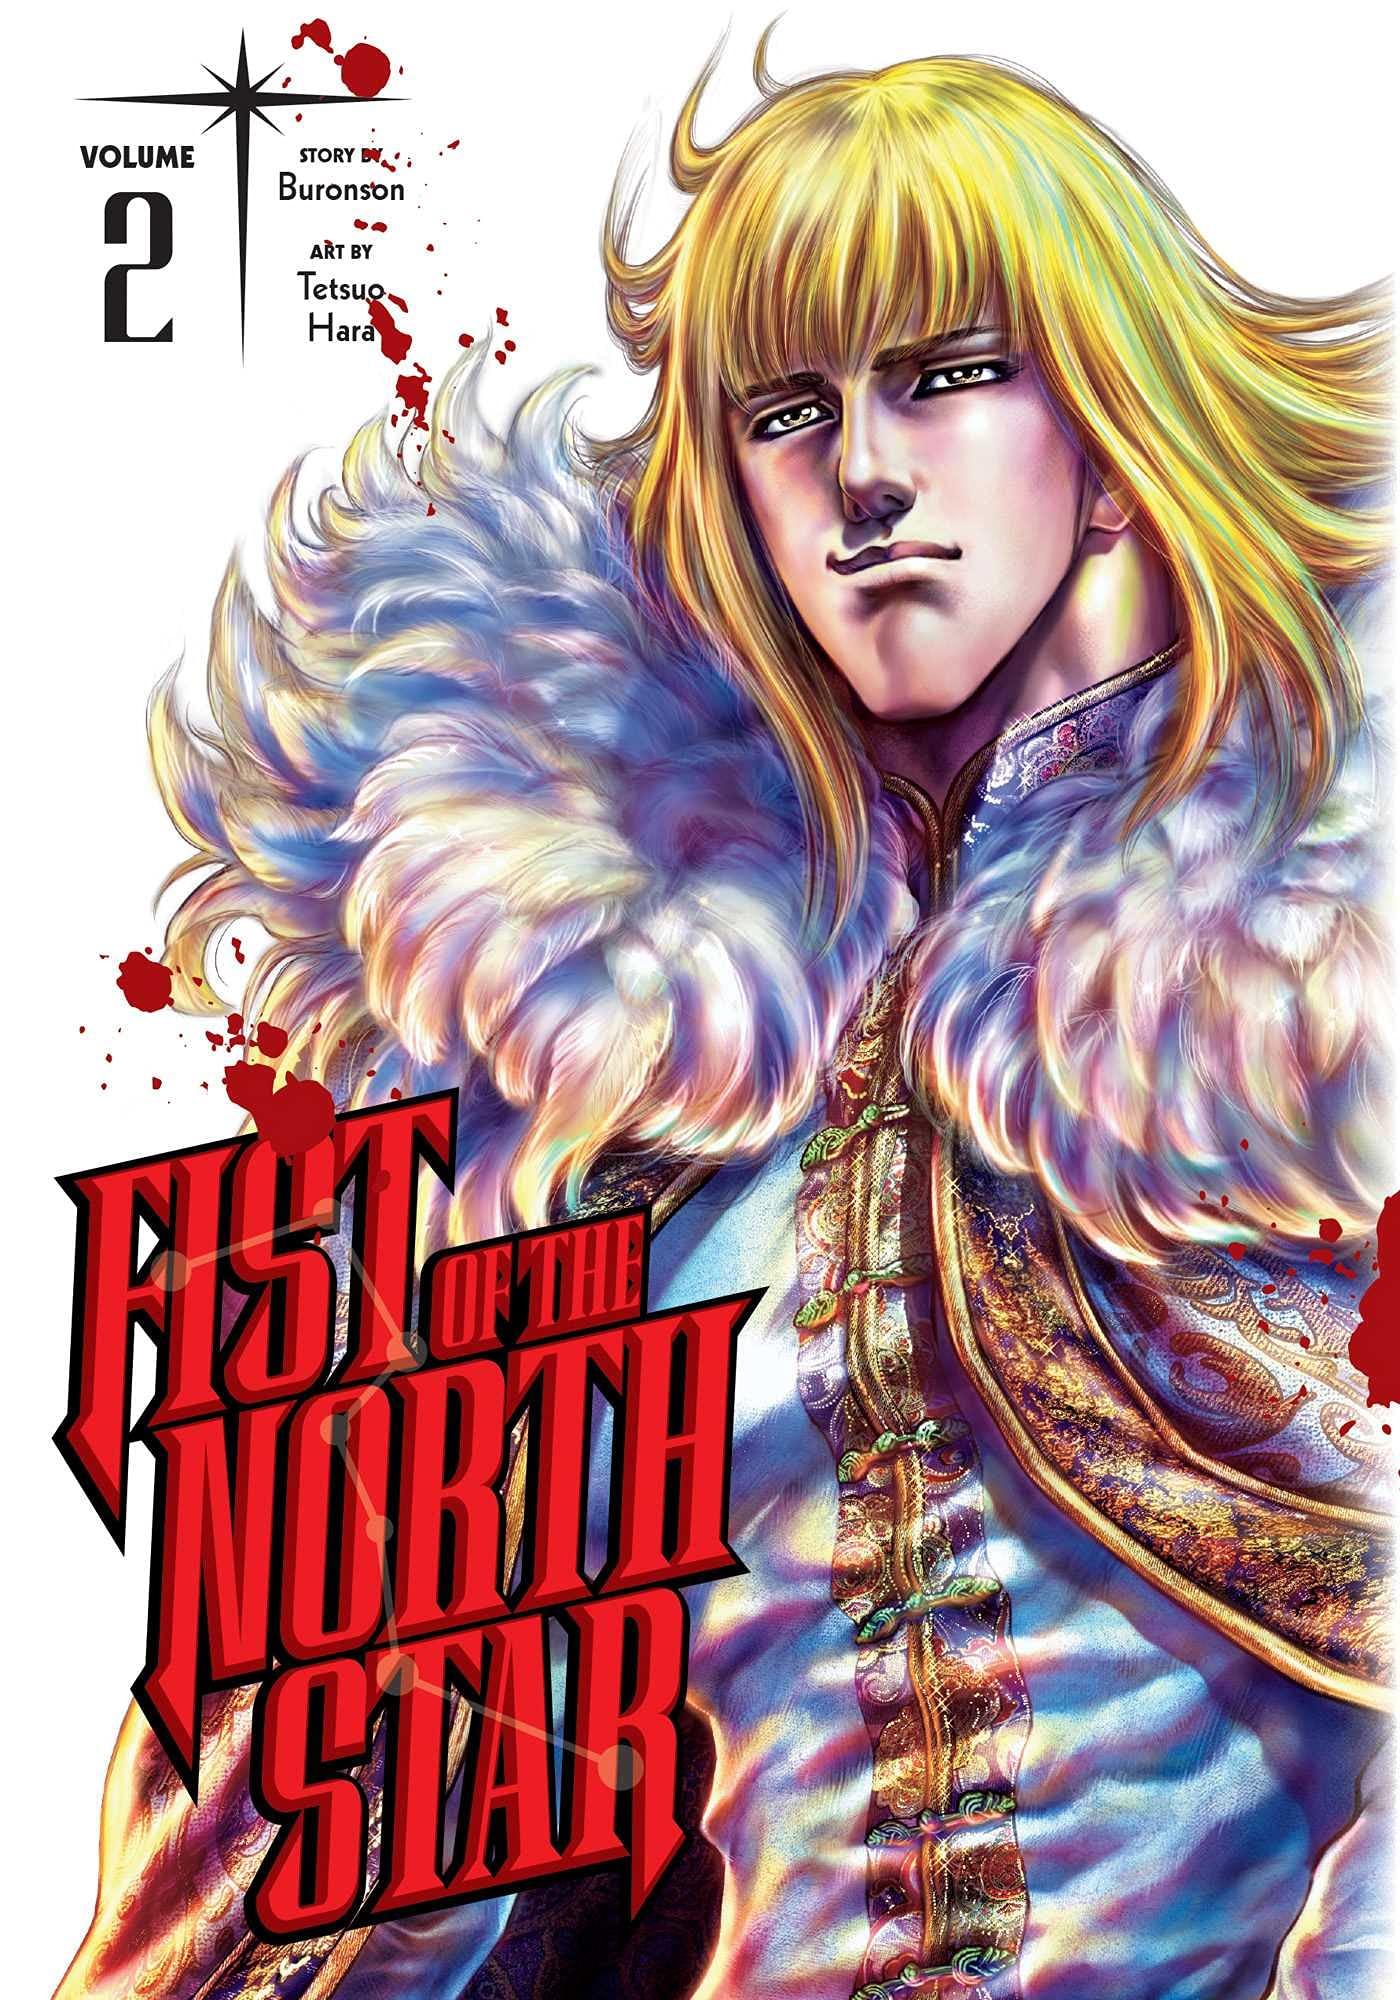 Fist of the North Star, Vol. 2 (2021)